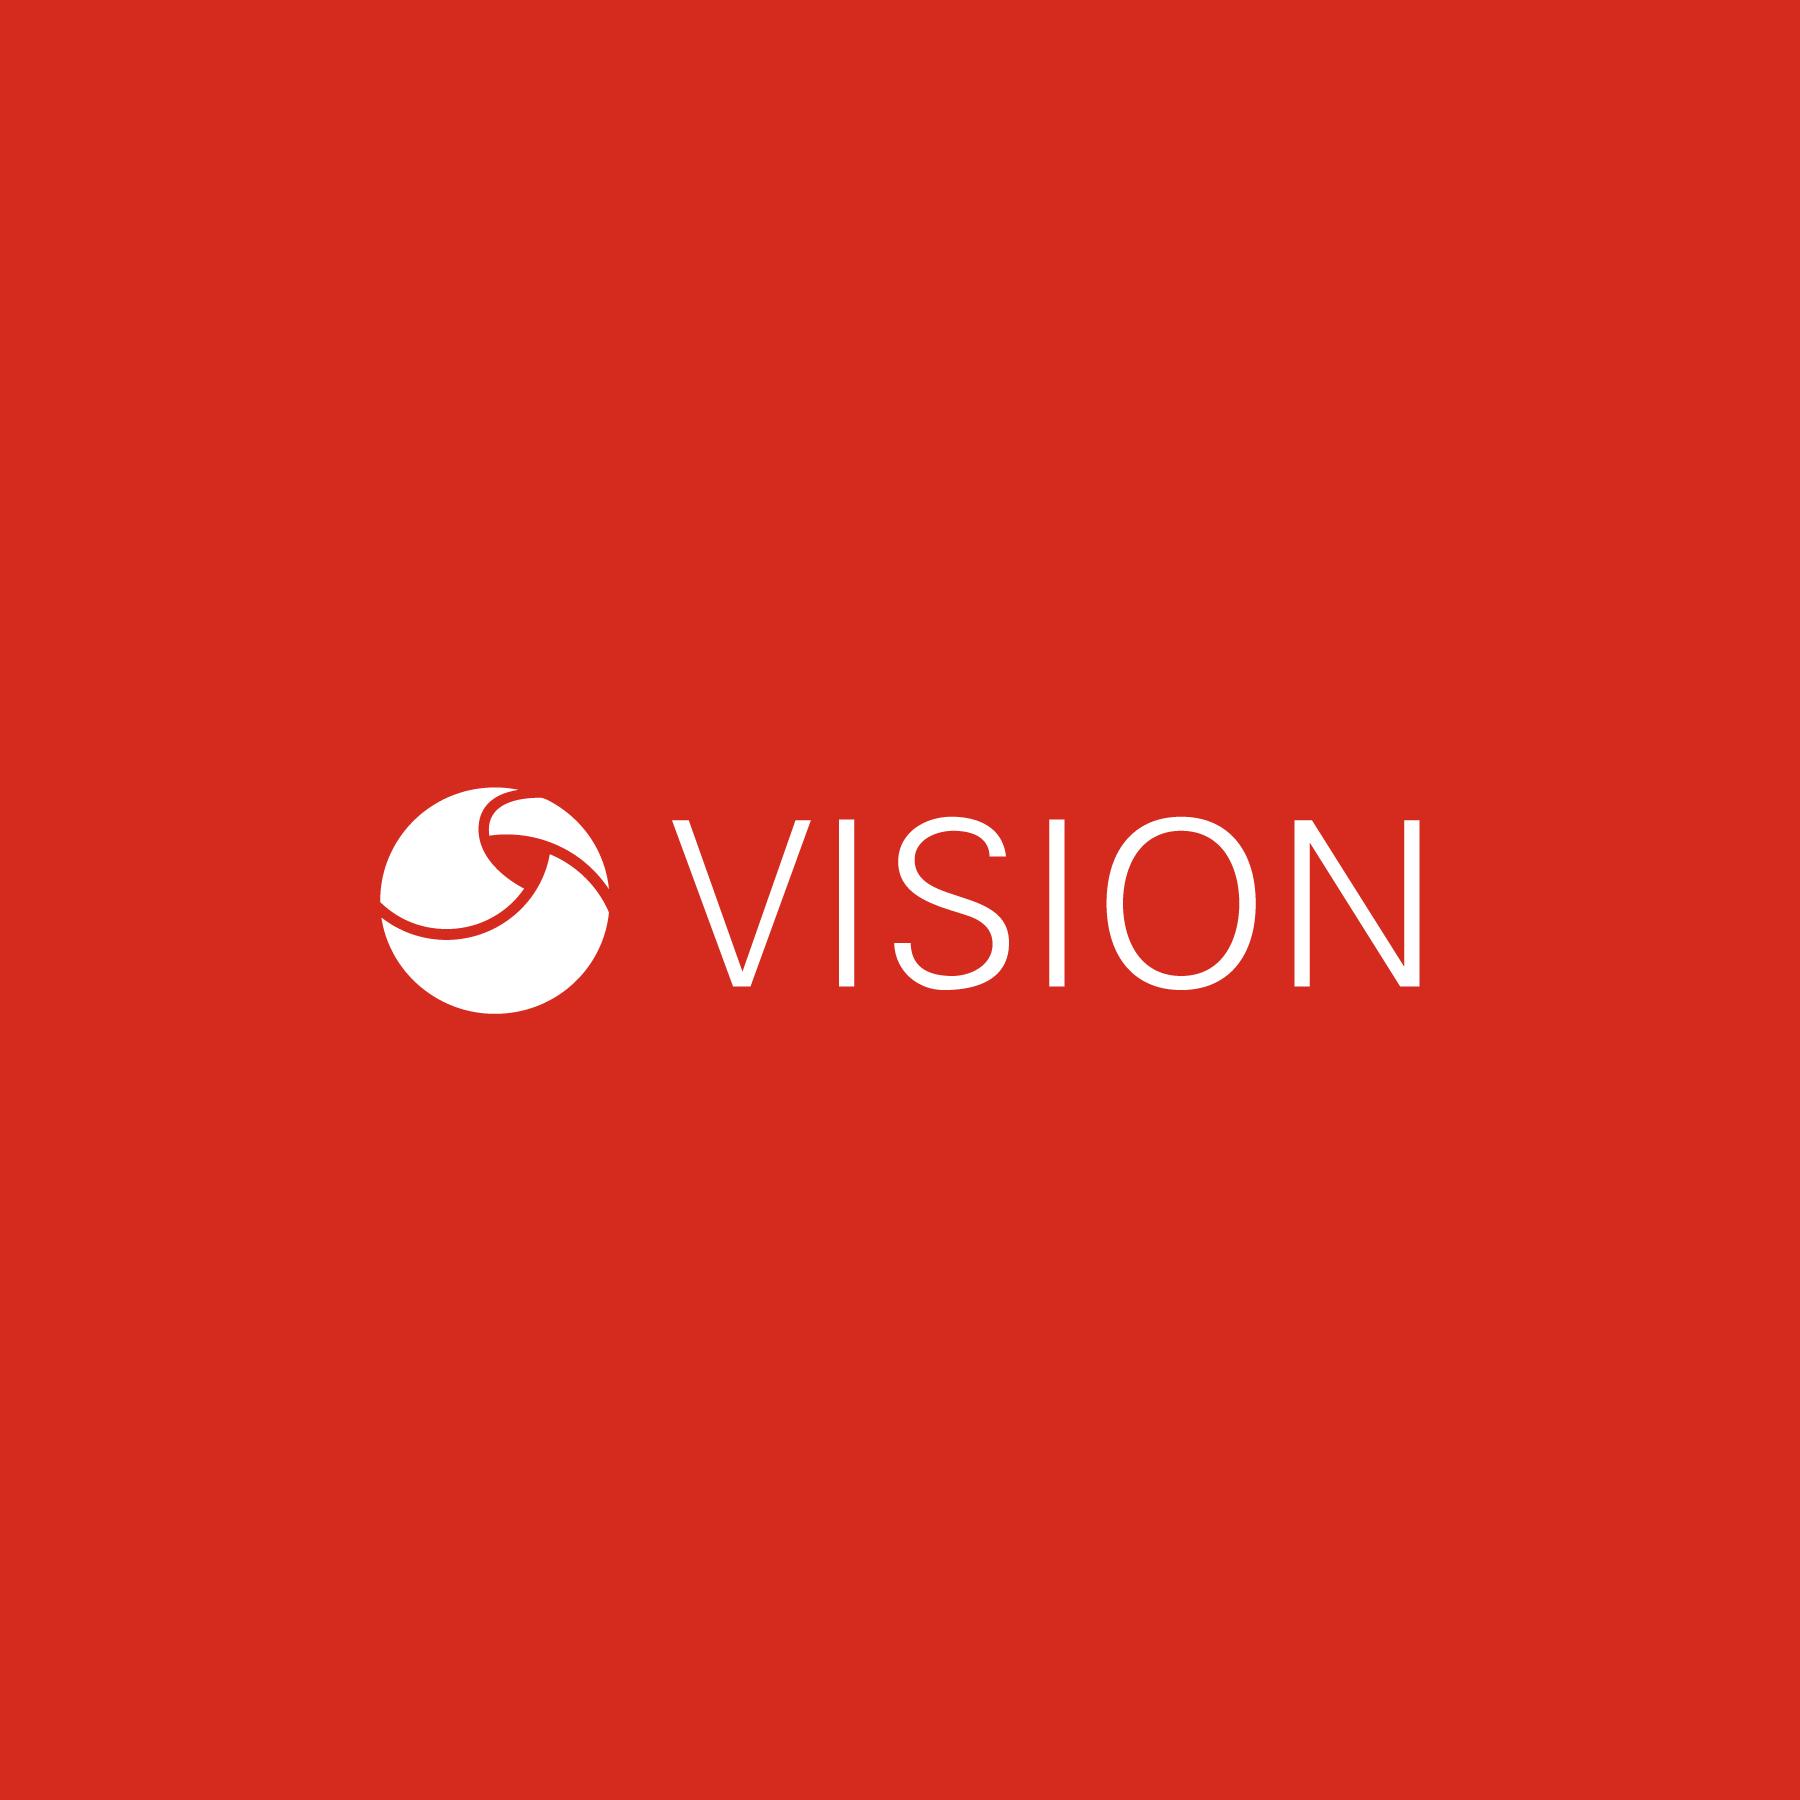 Vision brand logo